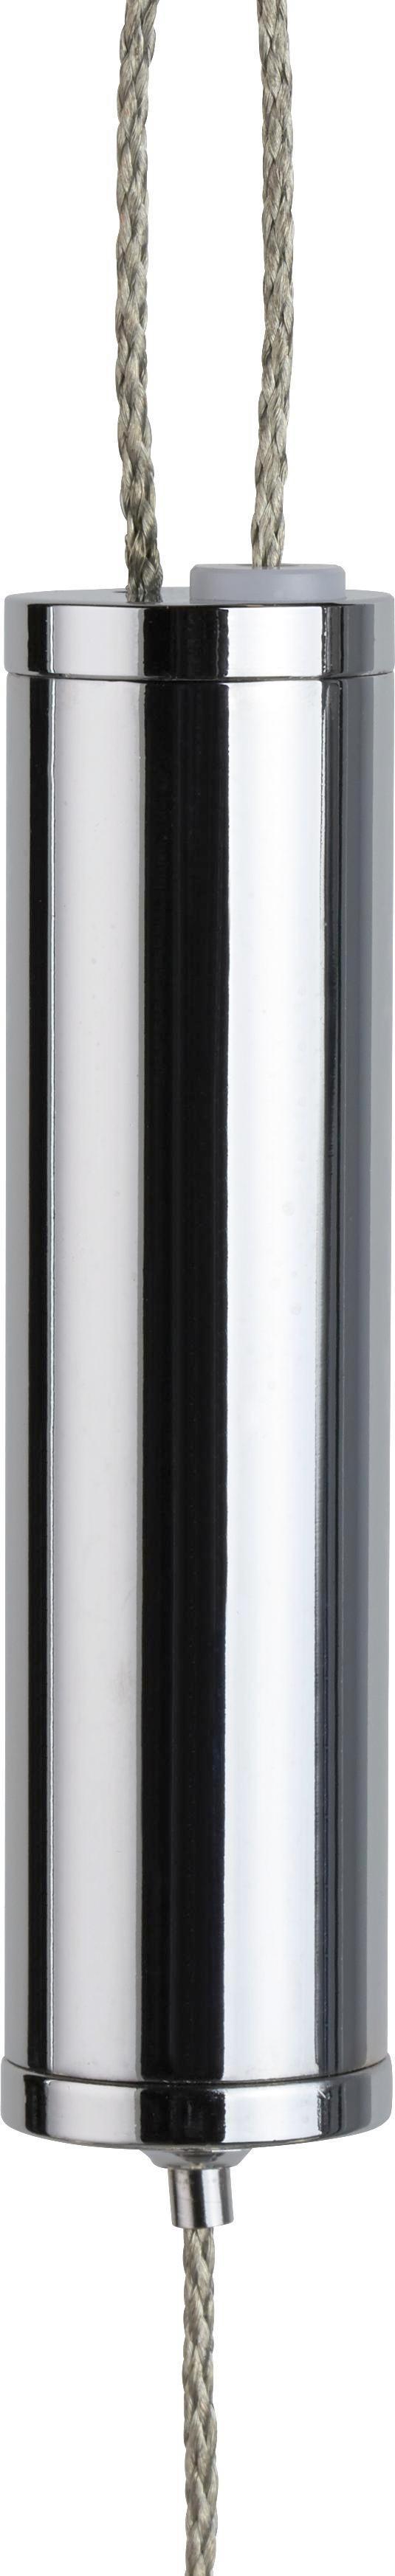 LED-Hängeleuchte Mathis - Chromfarben, MODERN, Glas/Kunststoff (80/10/150cm) - MÖMAX modern living